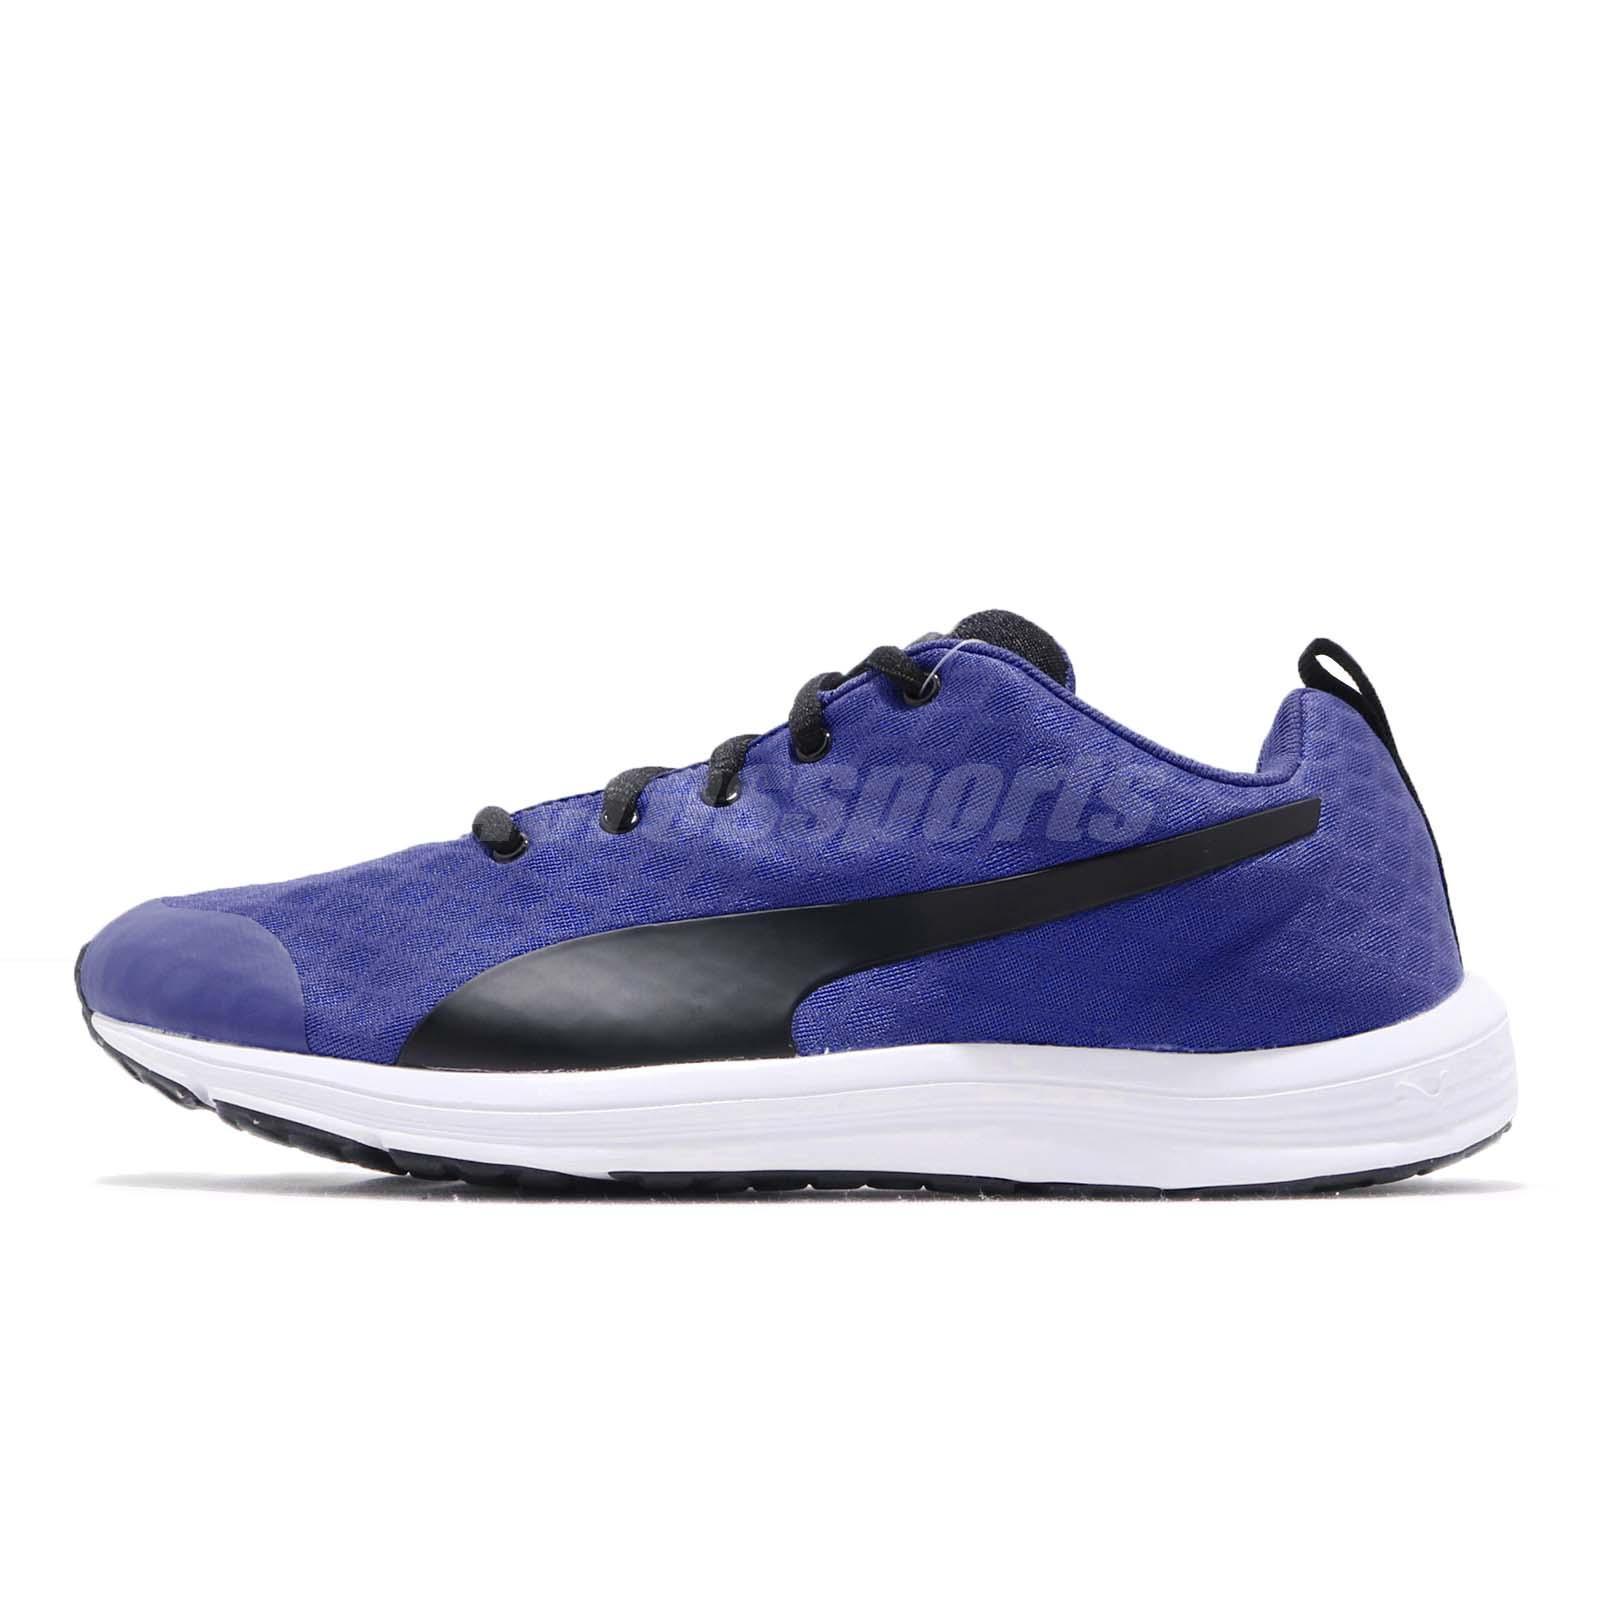 Puma Evader XT V2 FT Wns Royal Blue Black White Women Running Shoes  188978-01 39abebdf63476